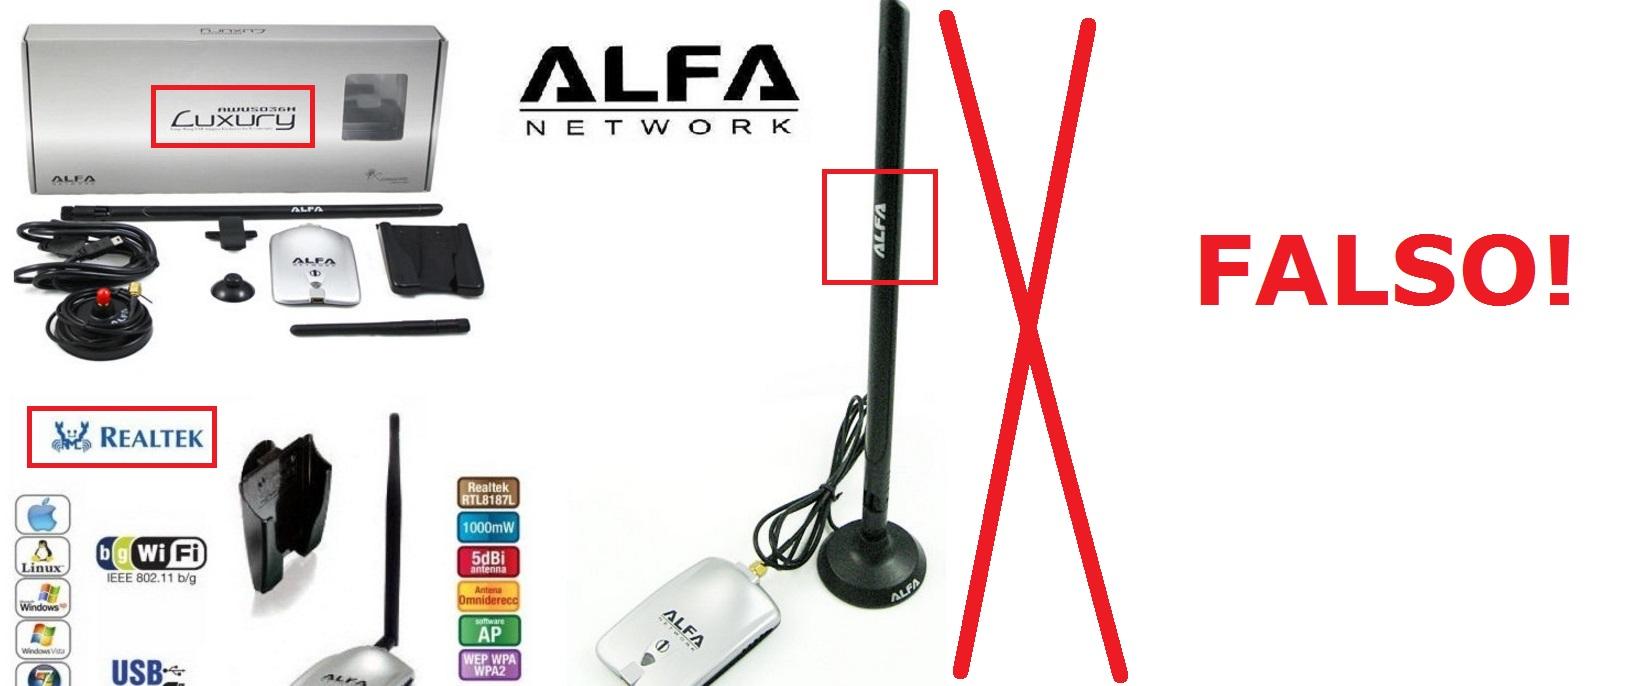 Alfa Network AWUS036H